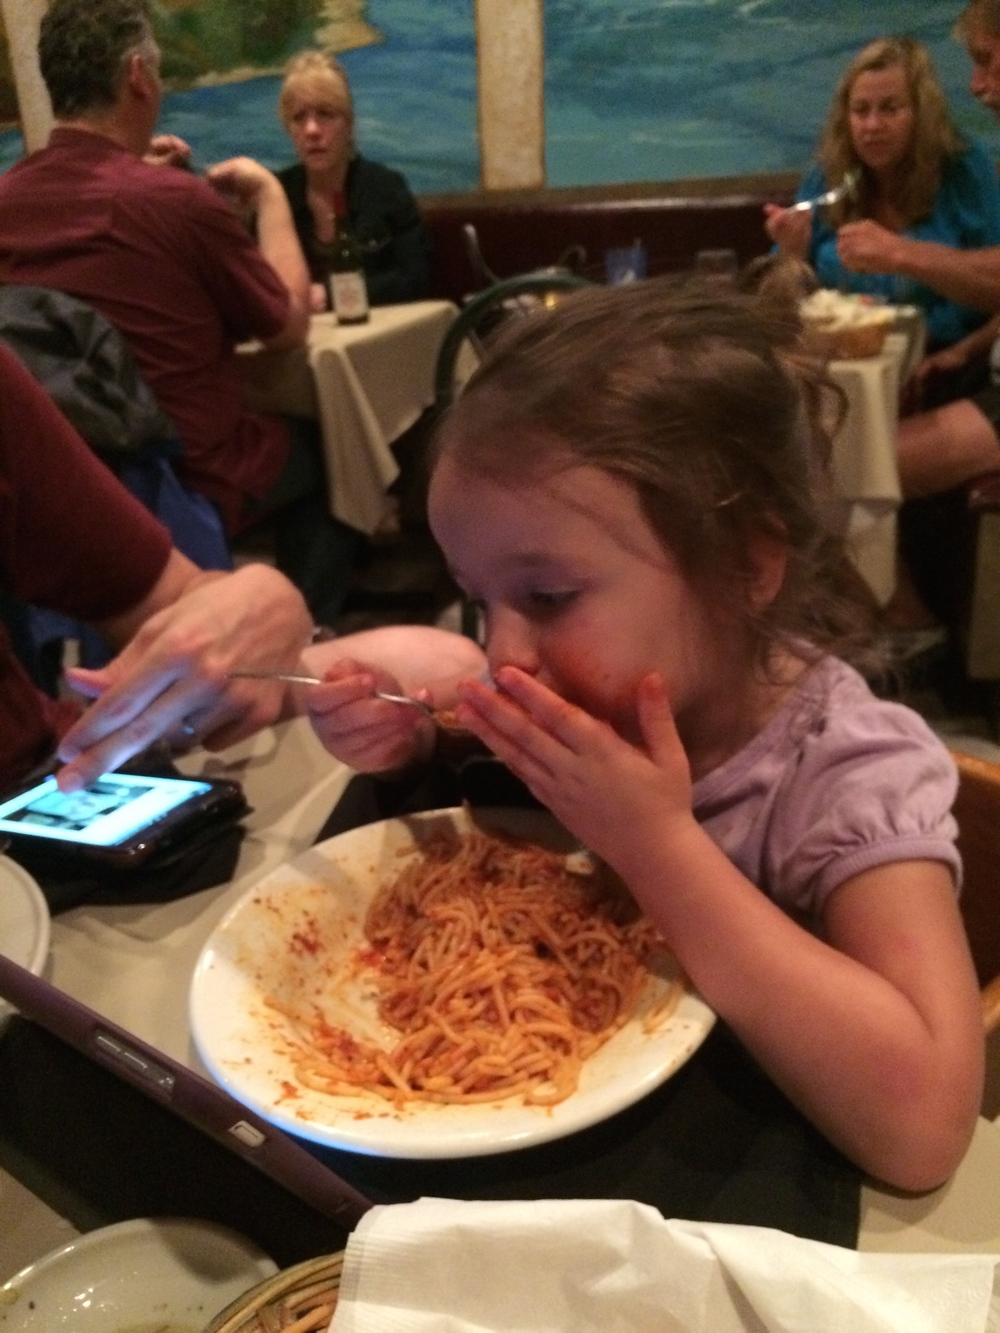 Double-fisting spaghetti